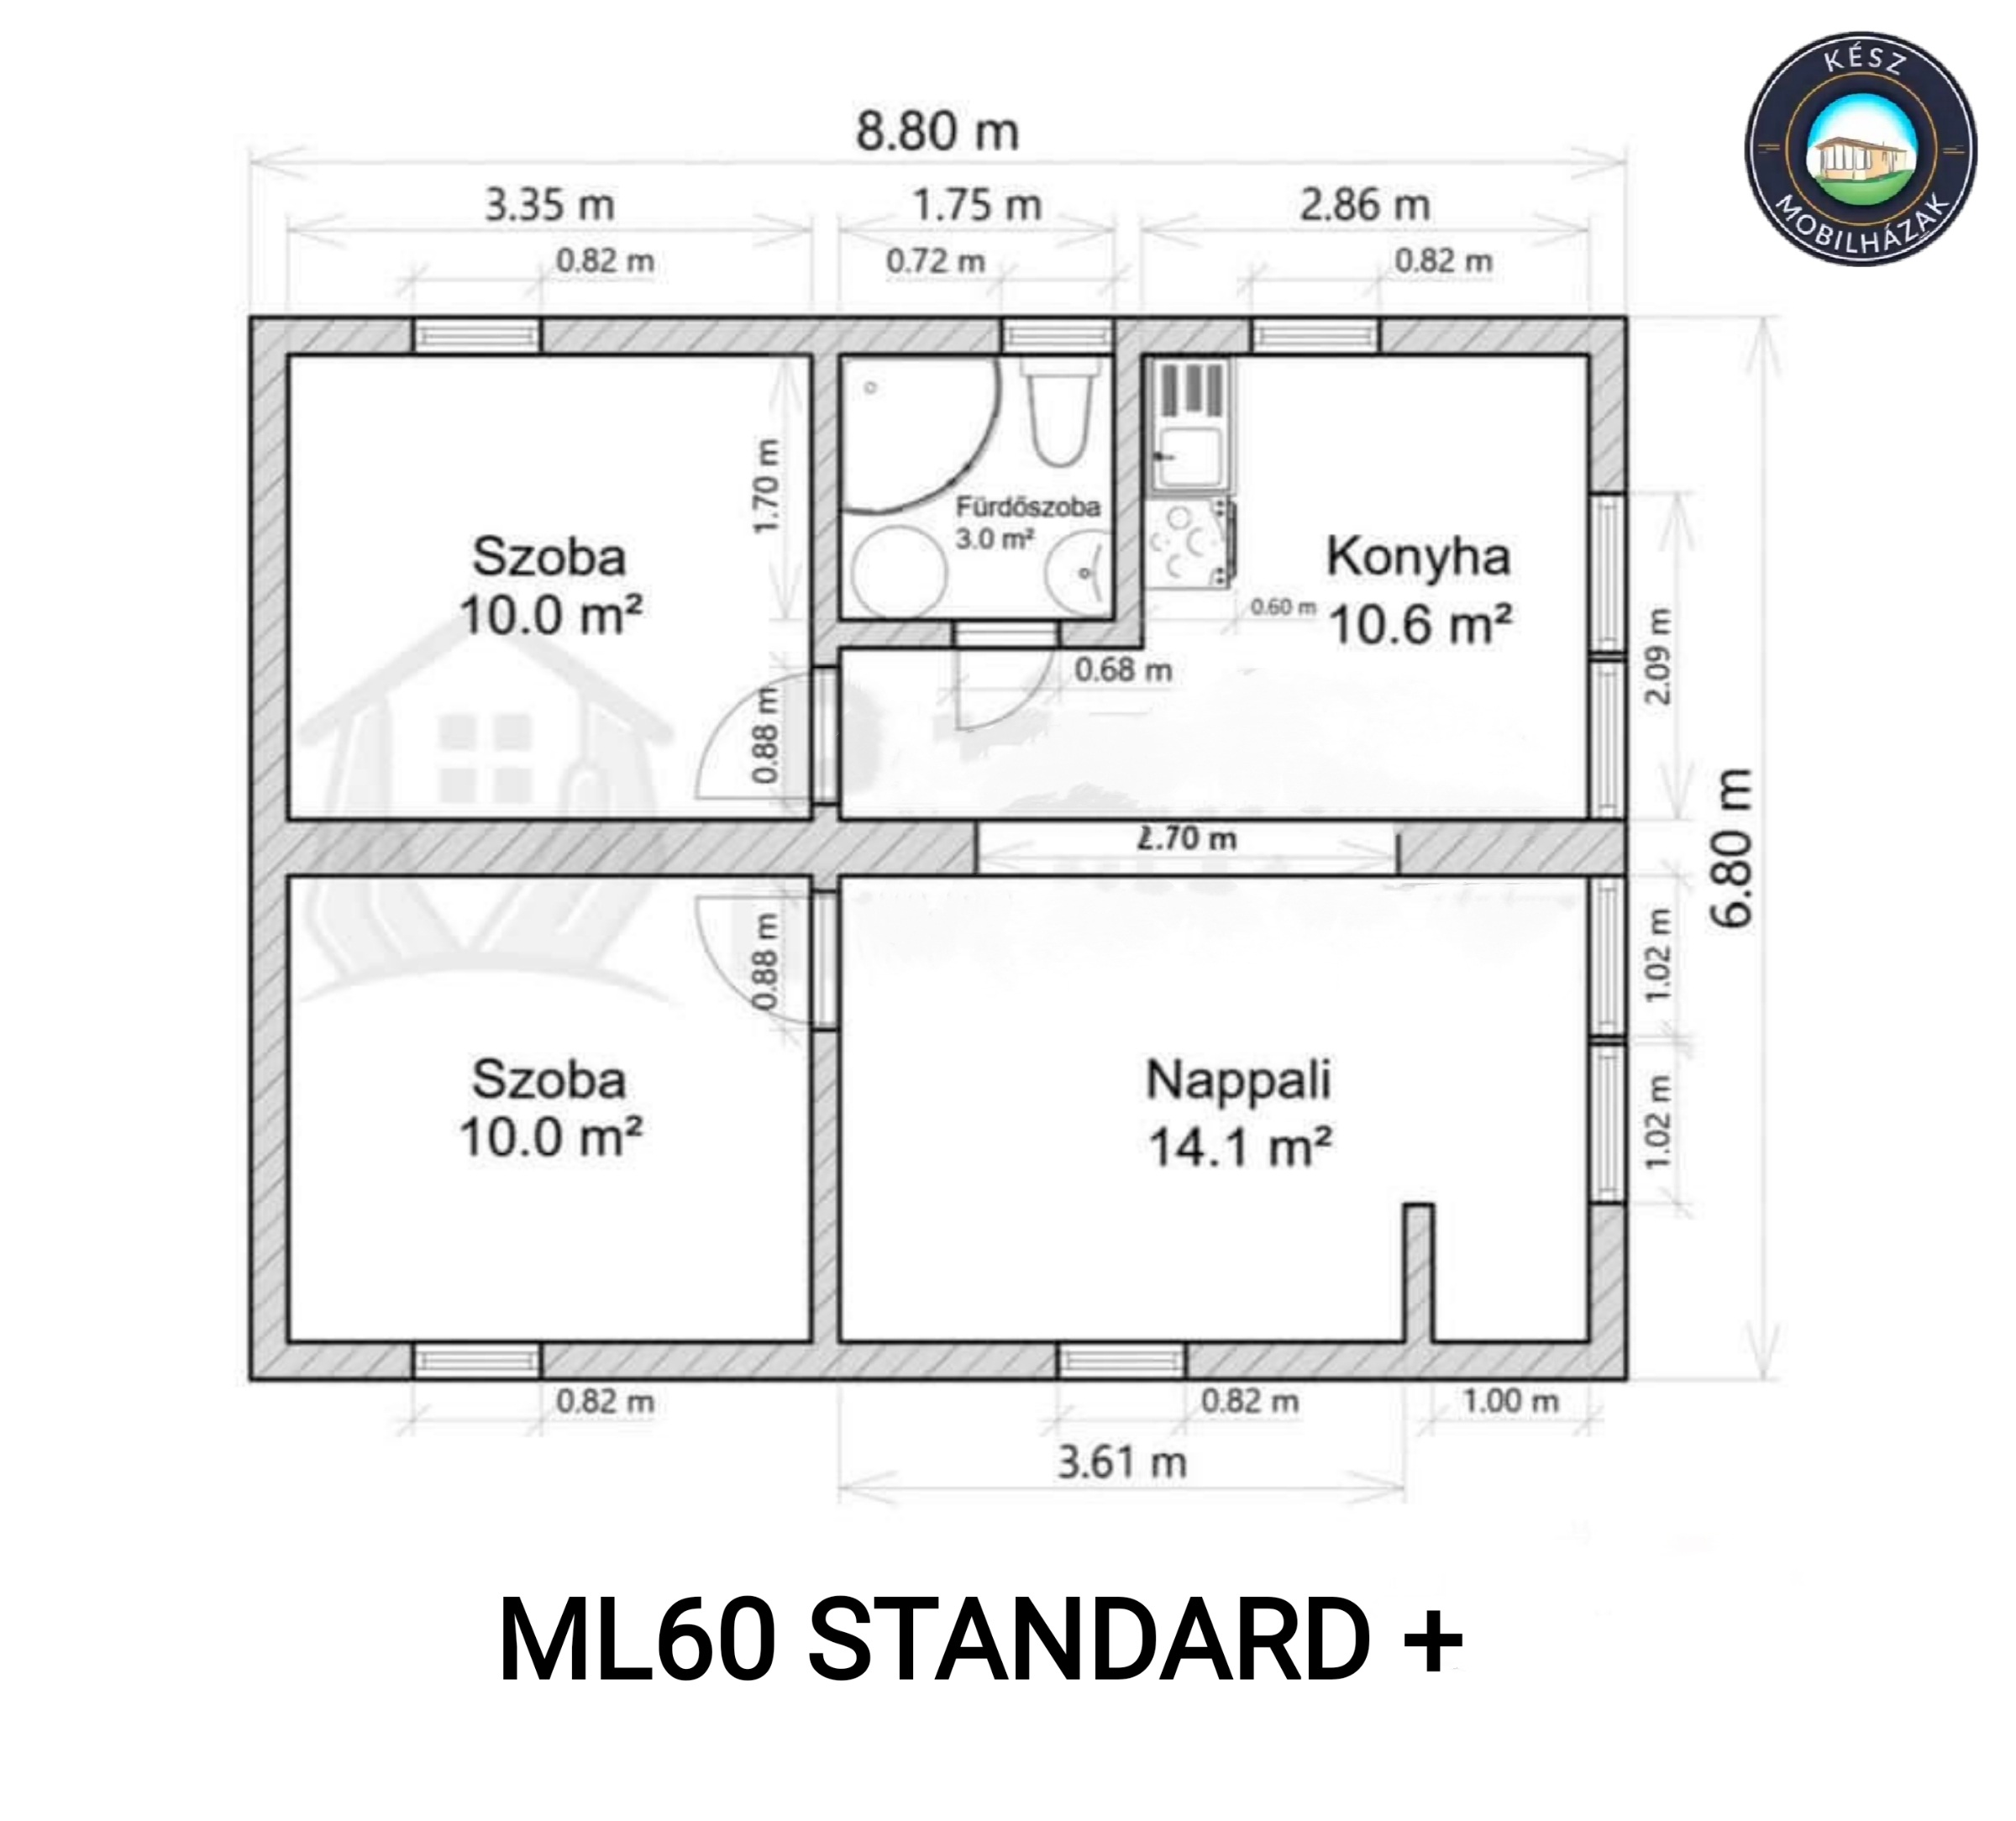 ML60 STANDARD+